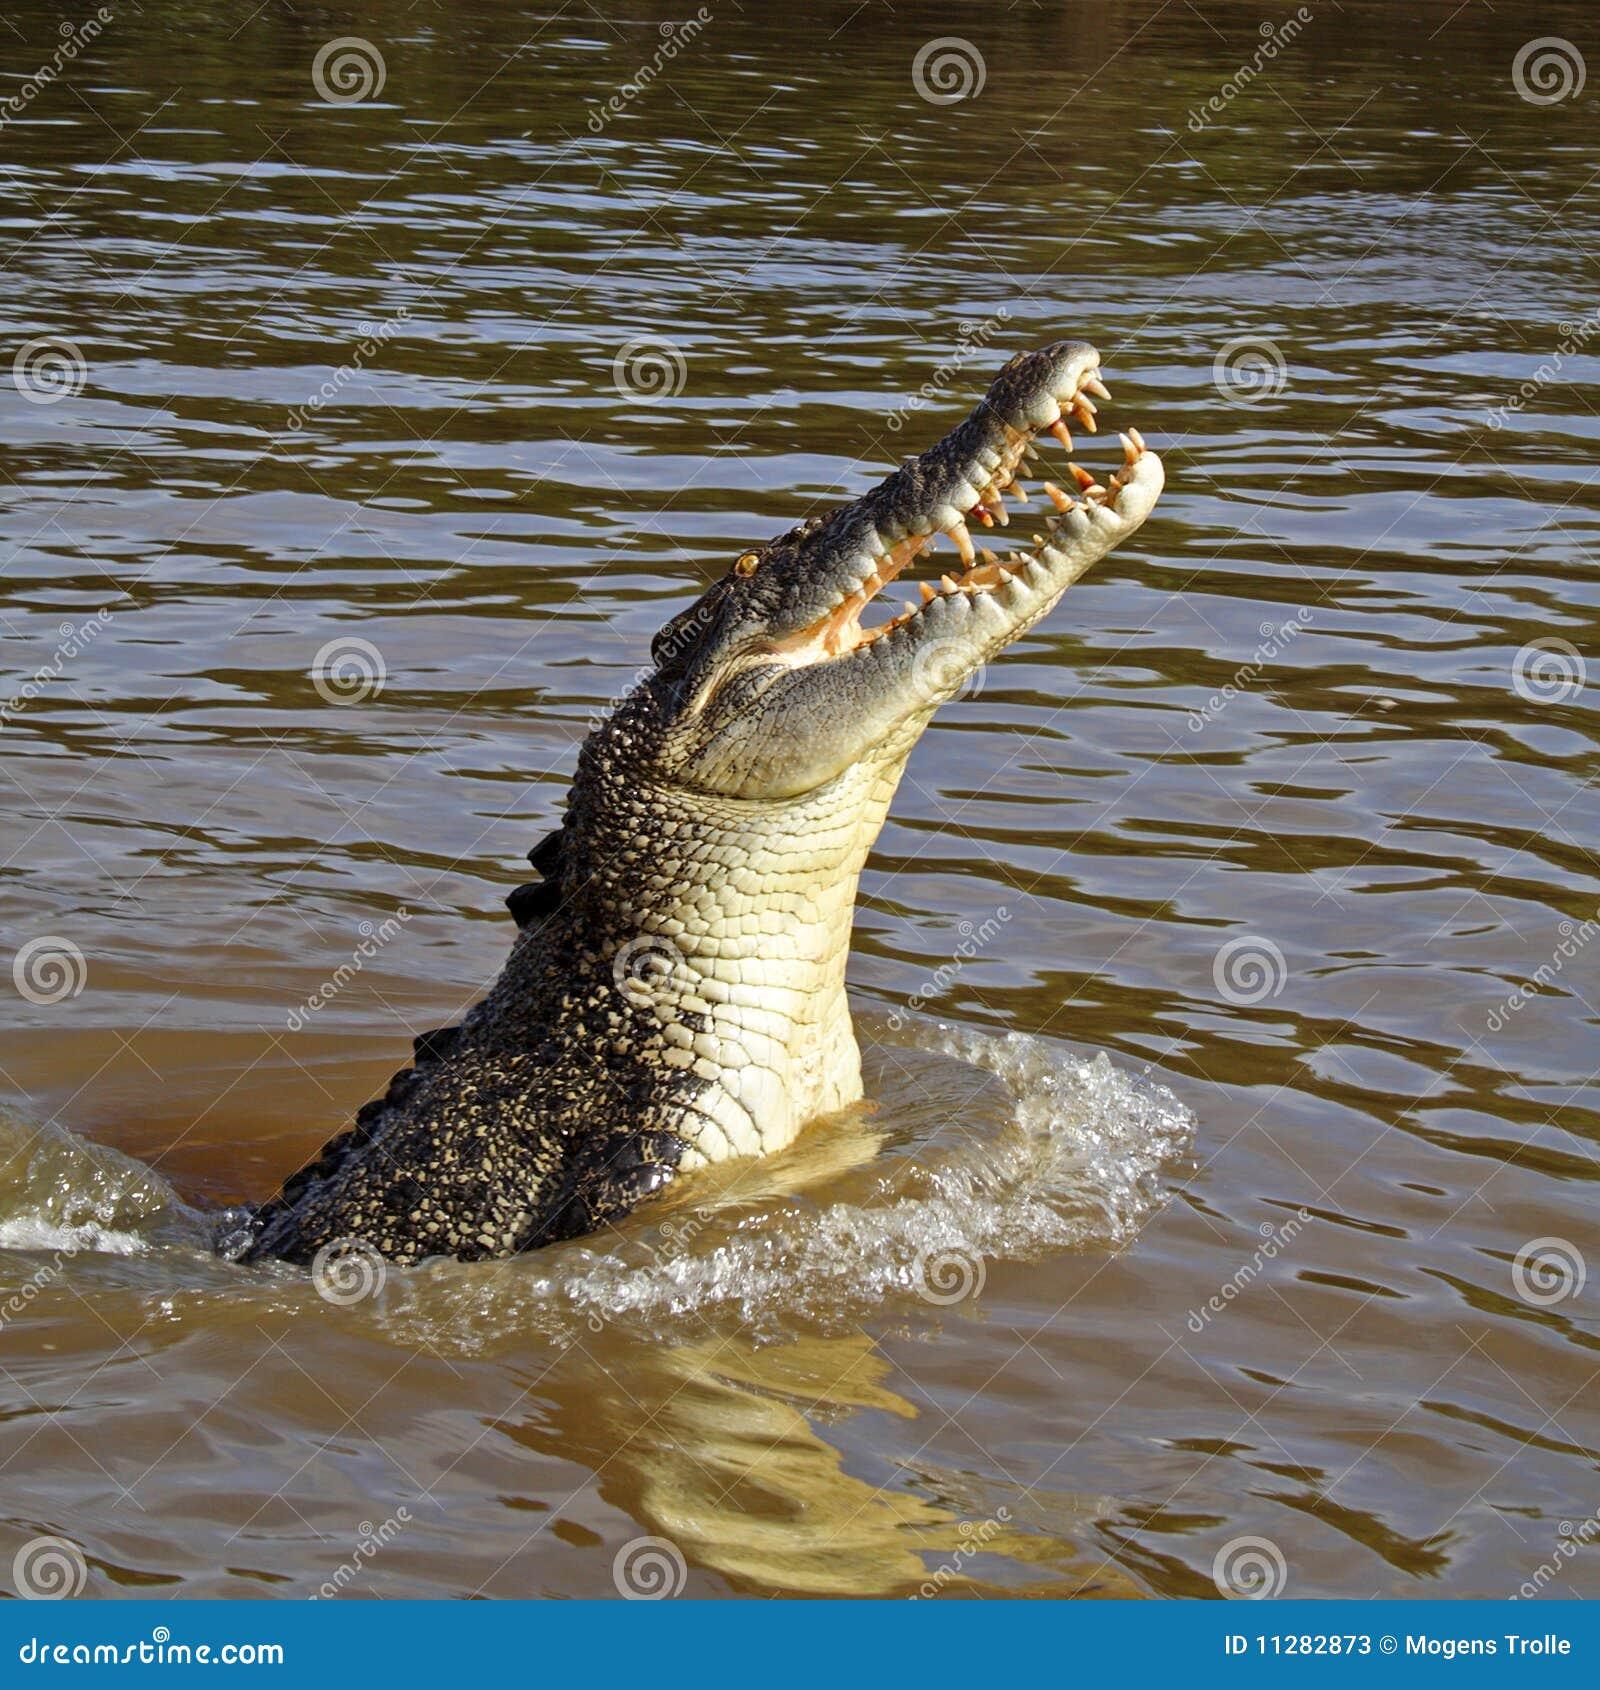 Wild jumping saltwater crocodile, Australia